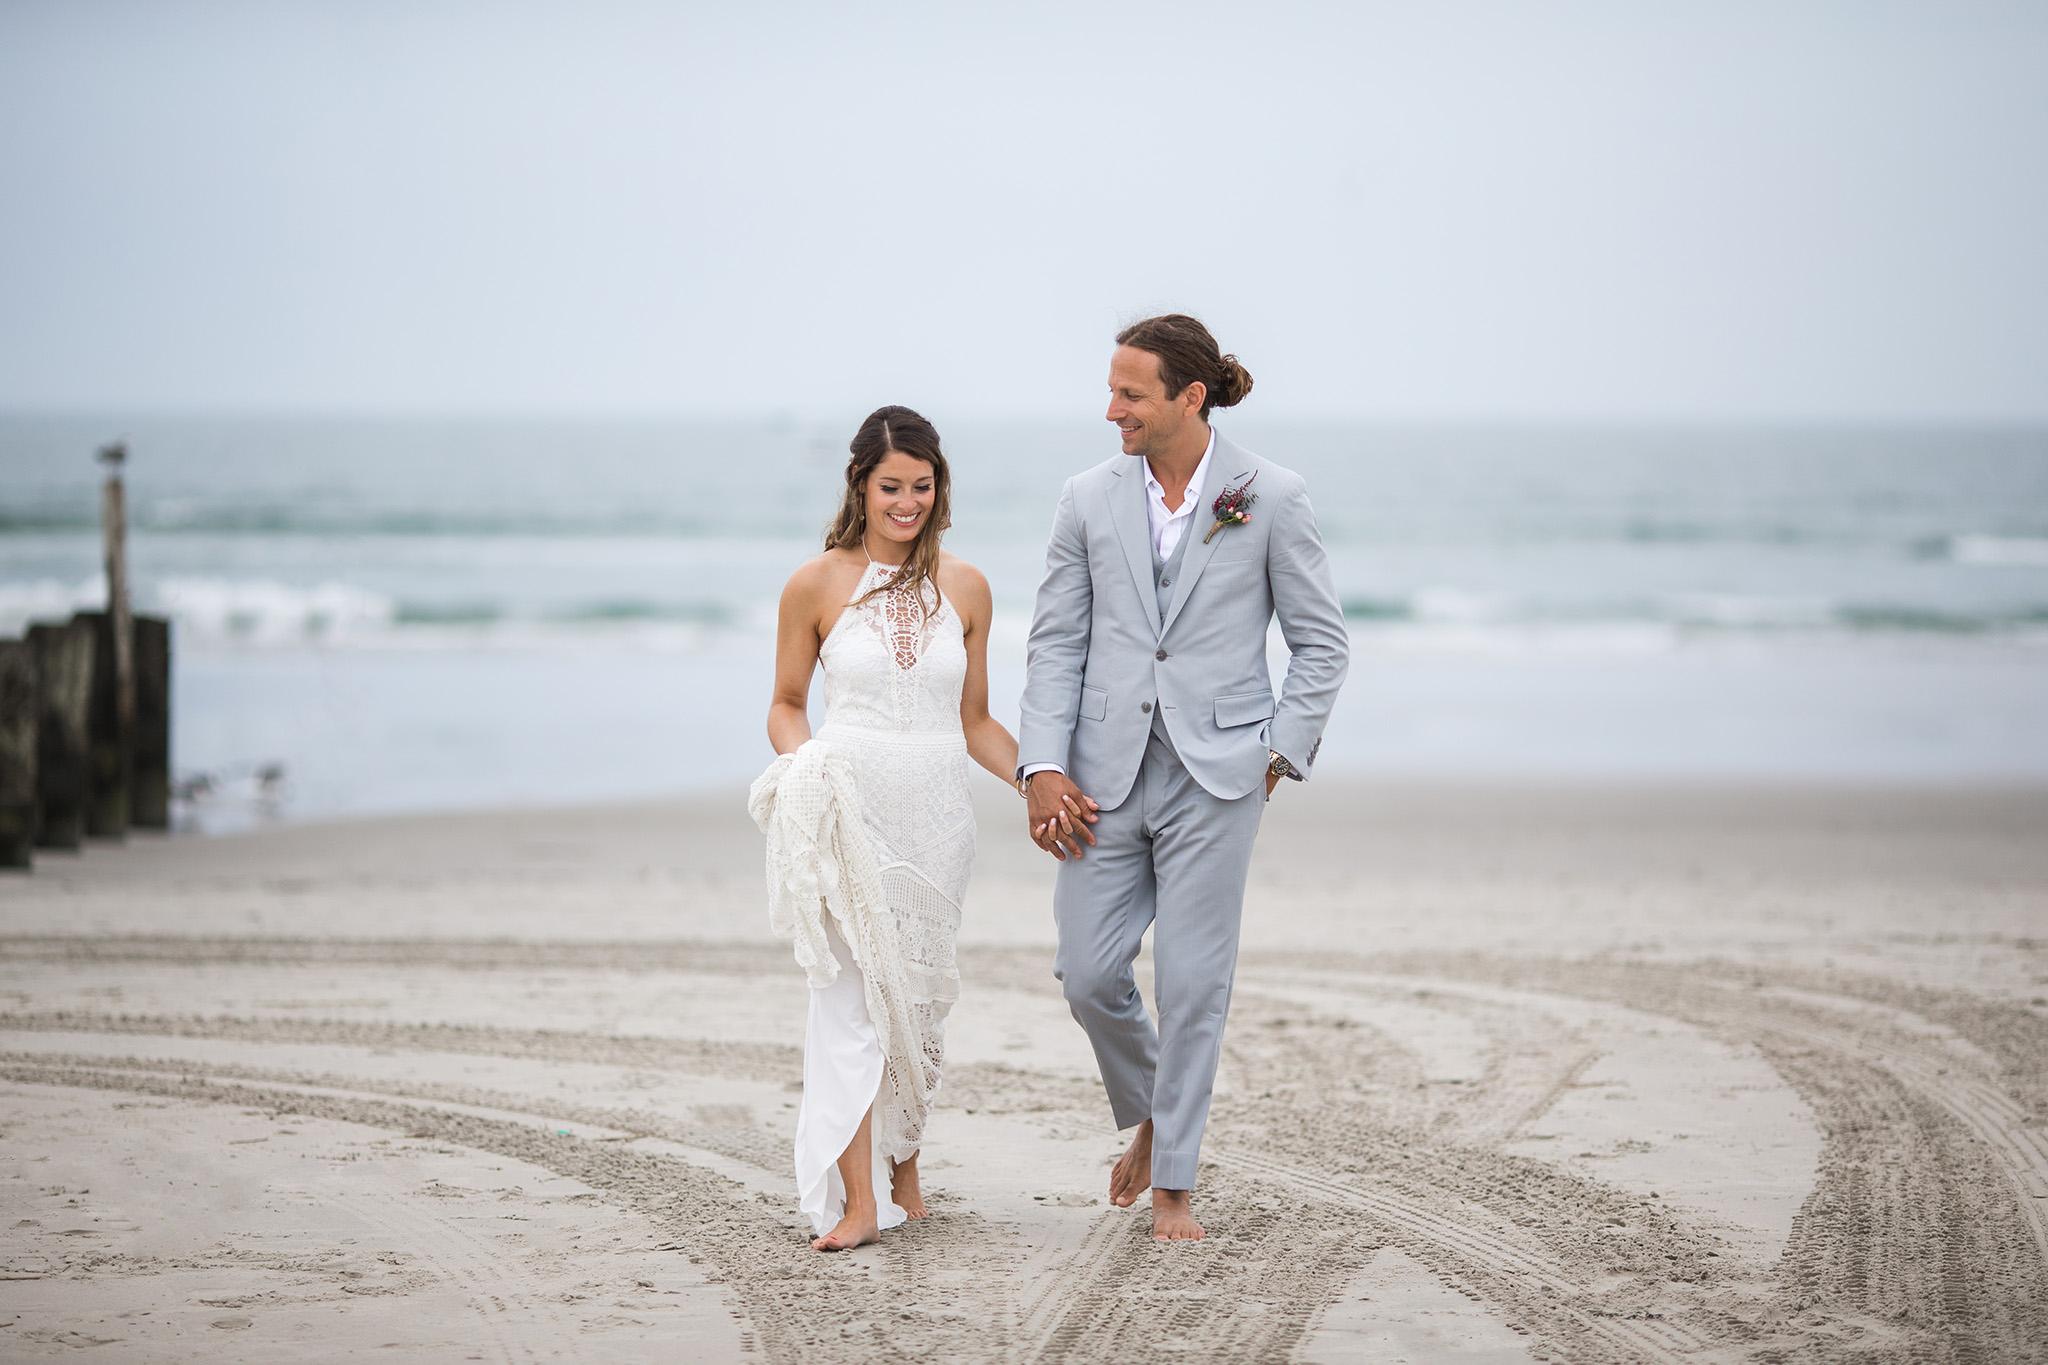 icona_diamond_beach_wedding_10.jpg